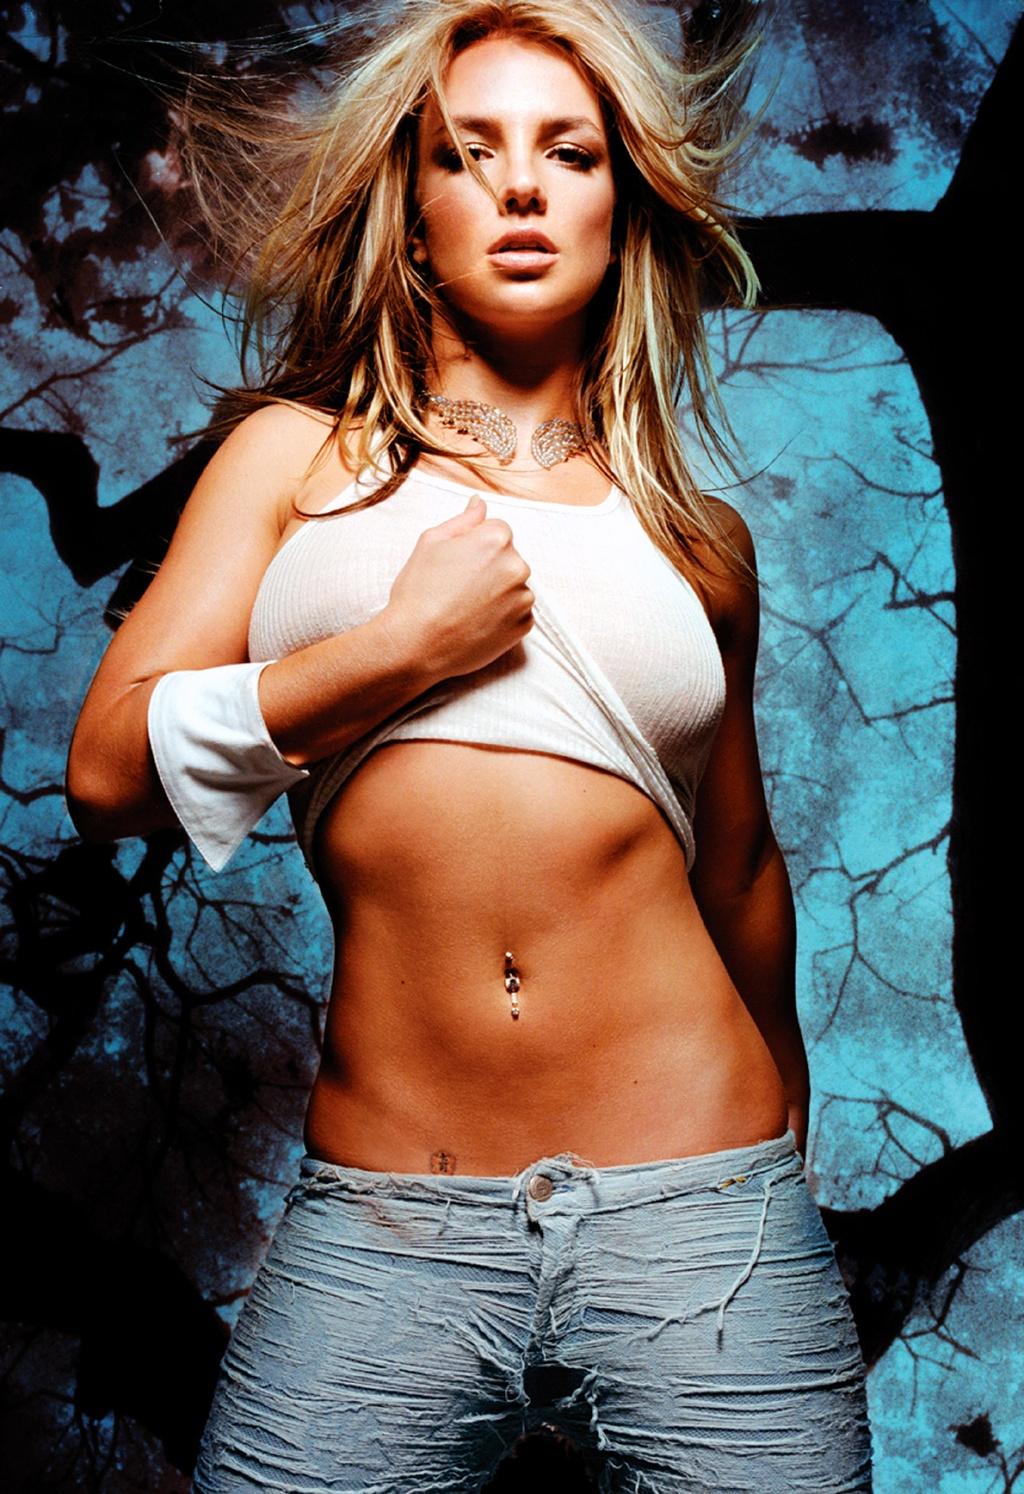 Britney Spears - cong chua mai me yeu duong va ly hon sau 55 tieng hinh anh 3 Britney_Spears_013.jpg